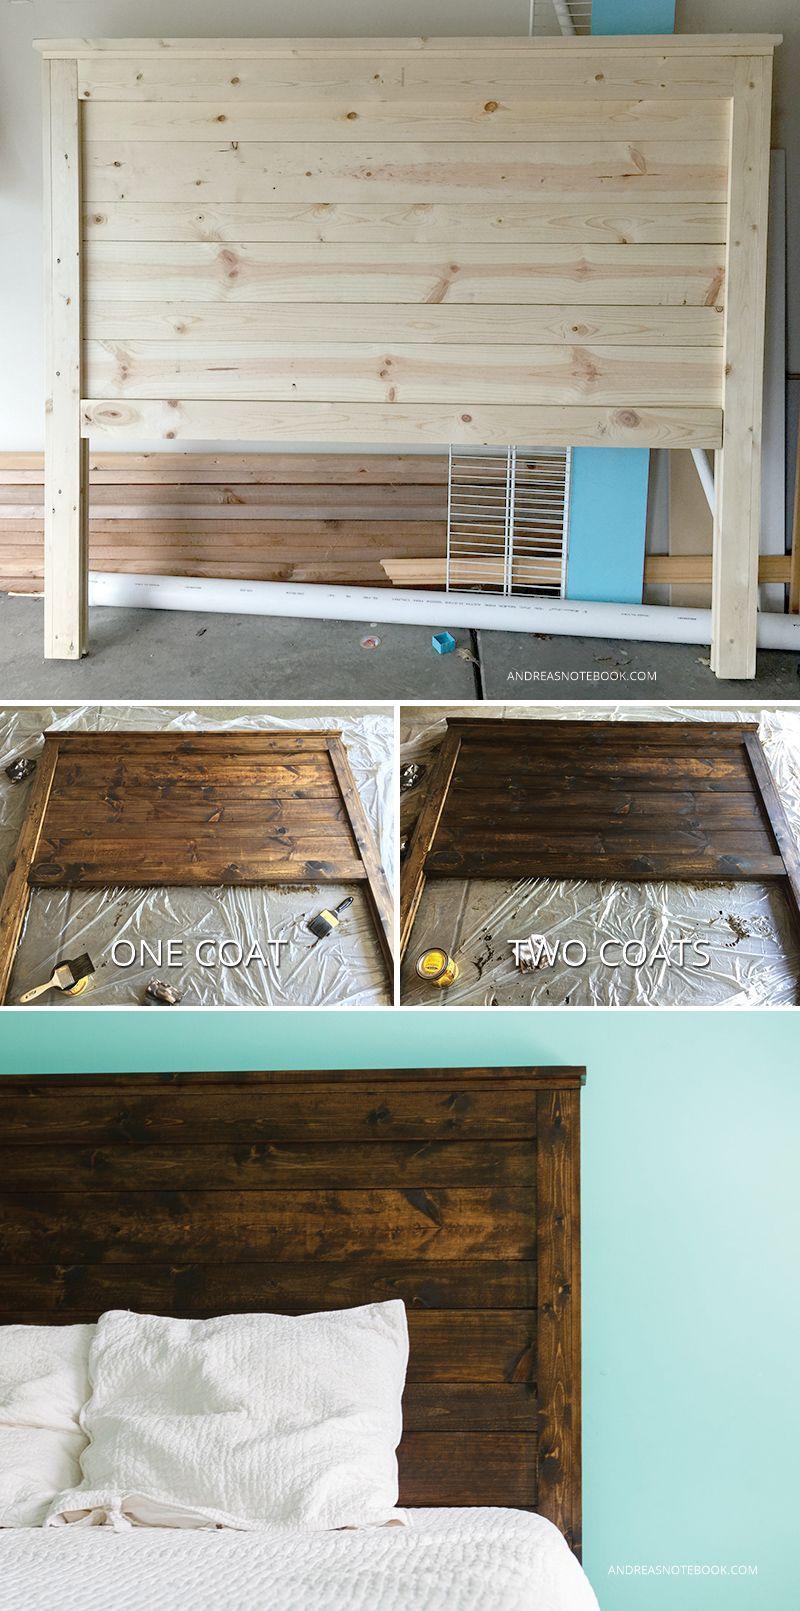 Master bedroom headboard ideas  Make your own DIY rustic headboard  AndreasNotebook  Home